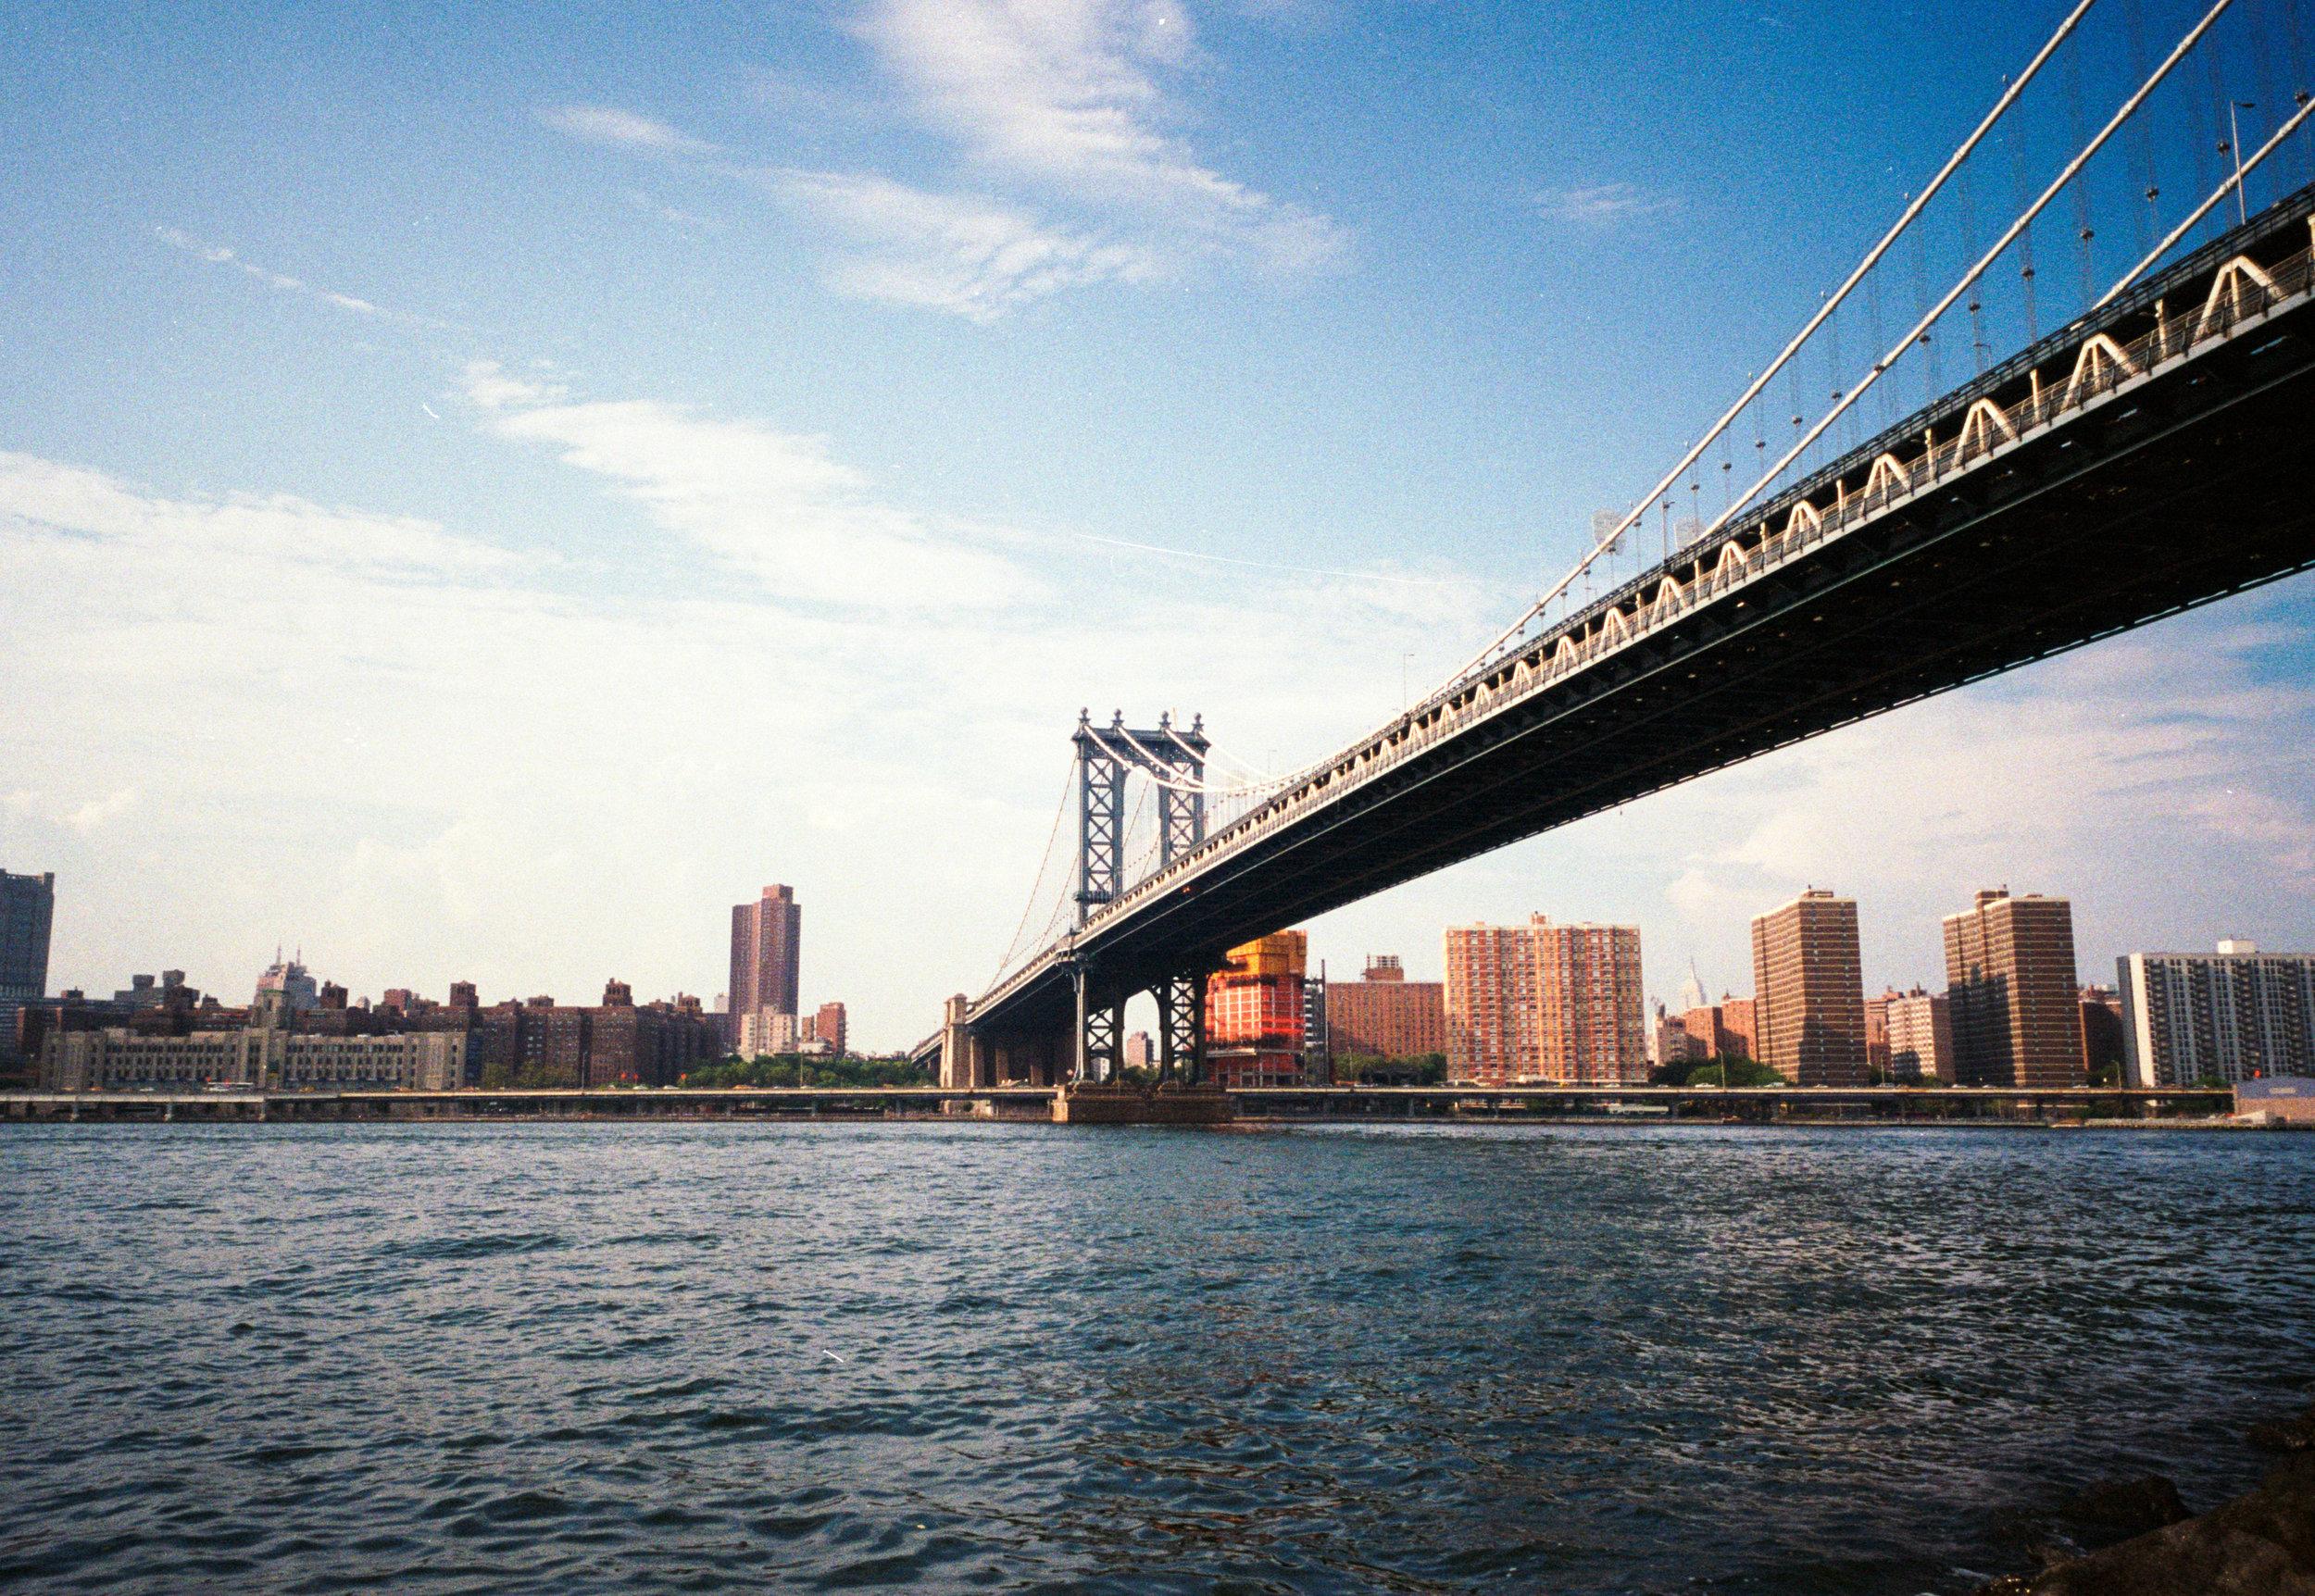 NYCWLK2-24.jpg